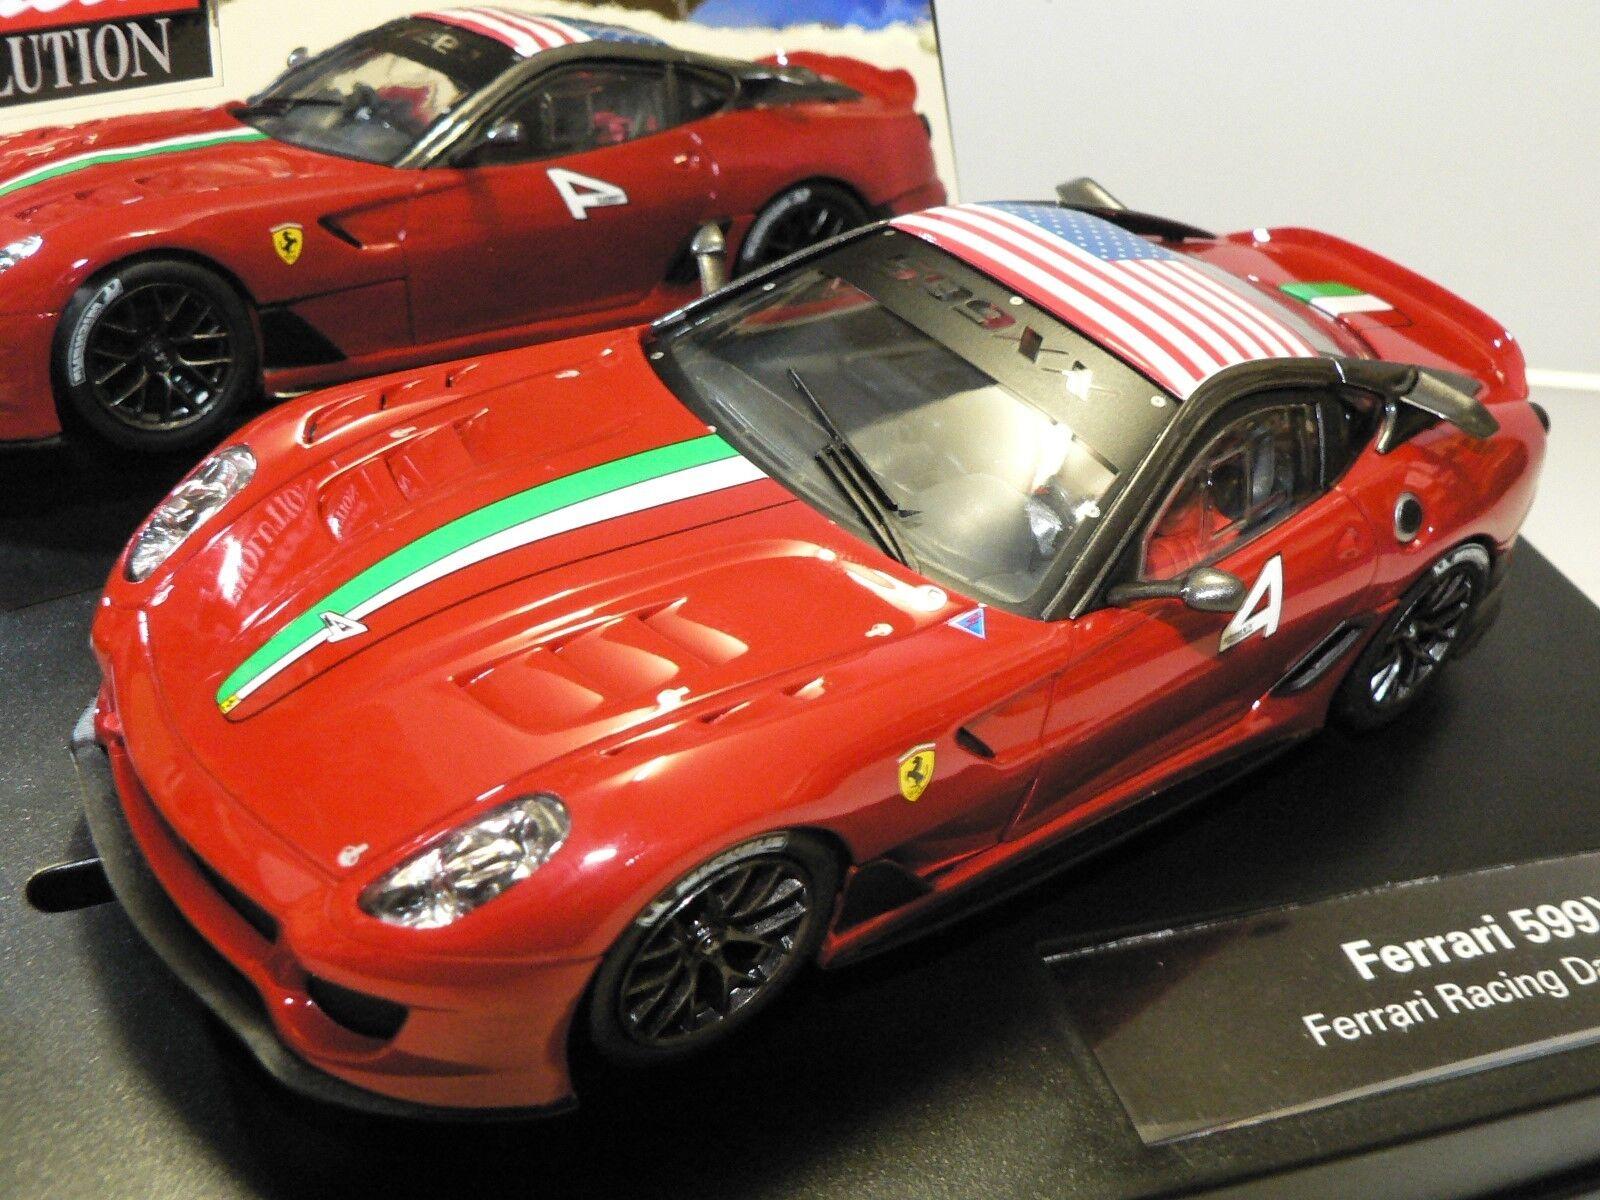 Carrera Evolution Ferrari 599XX Ferrari Racing Days No.4 27400 Nuovo